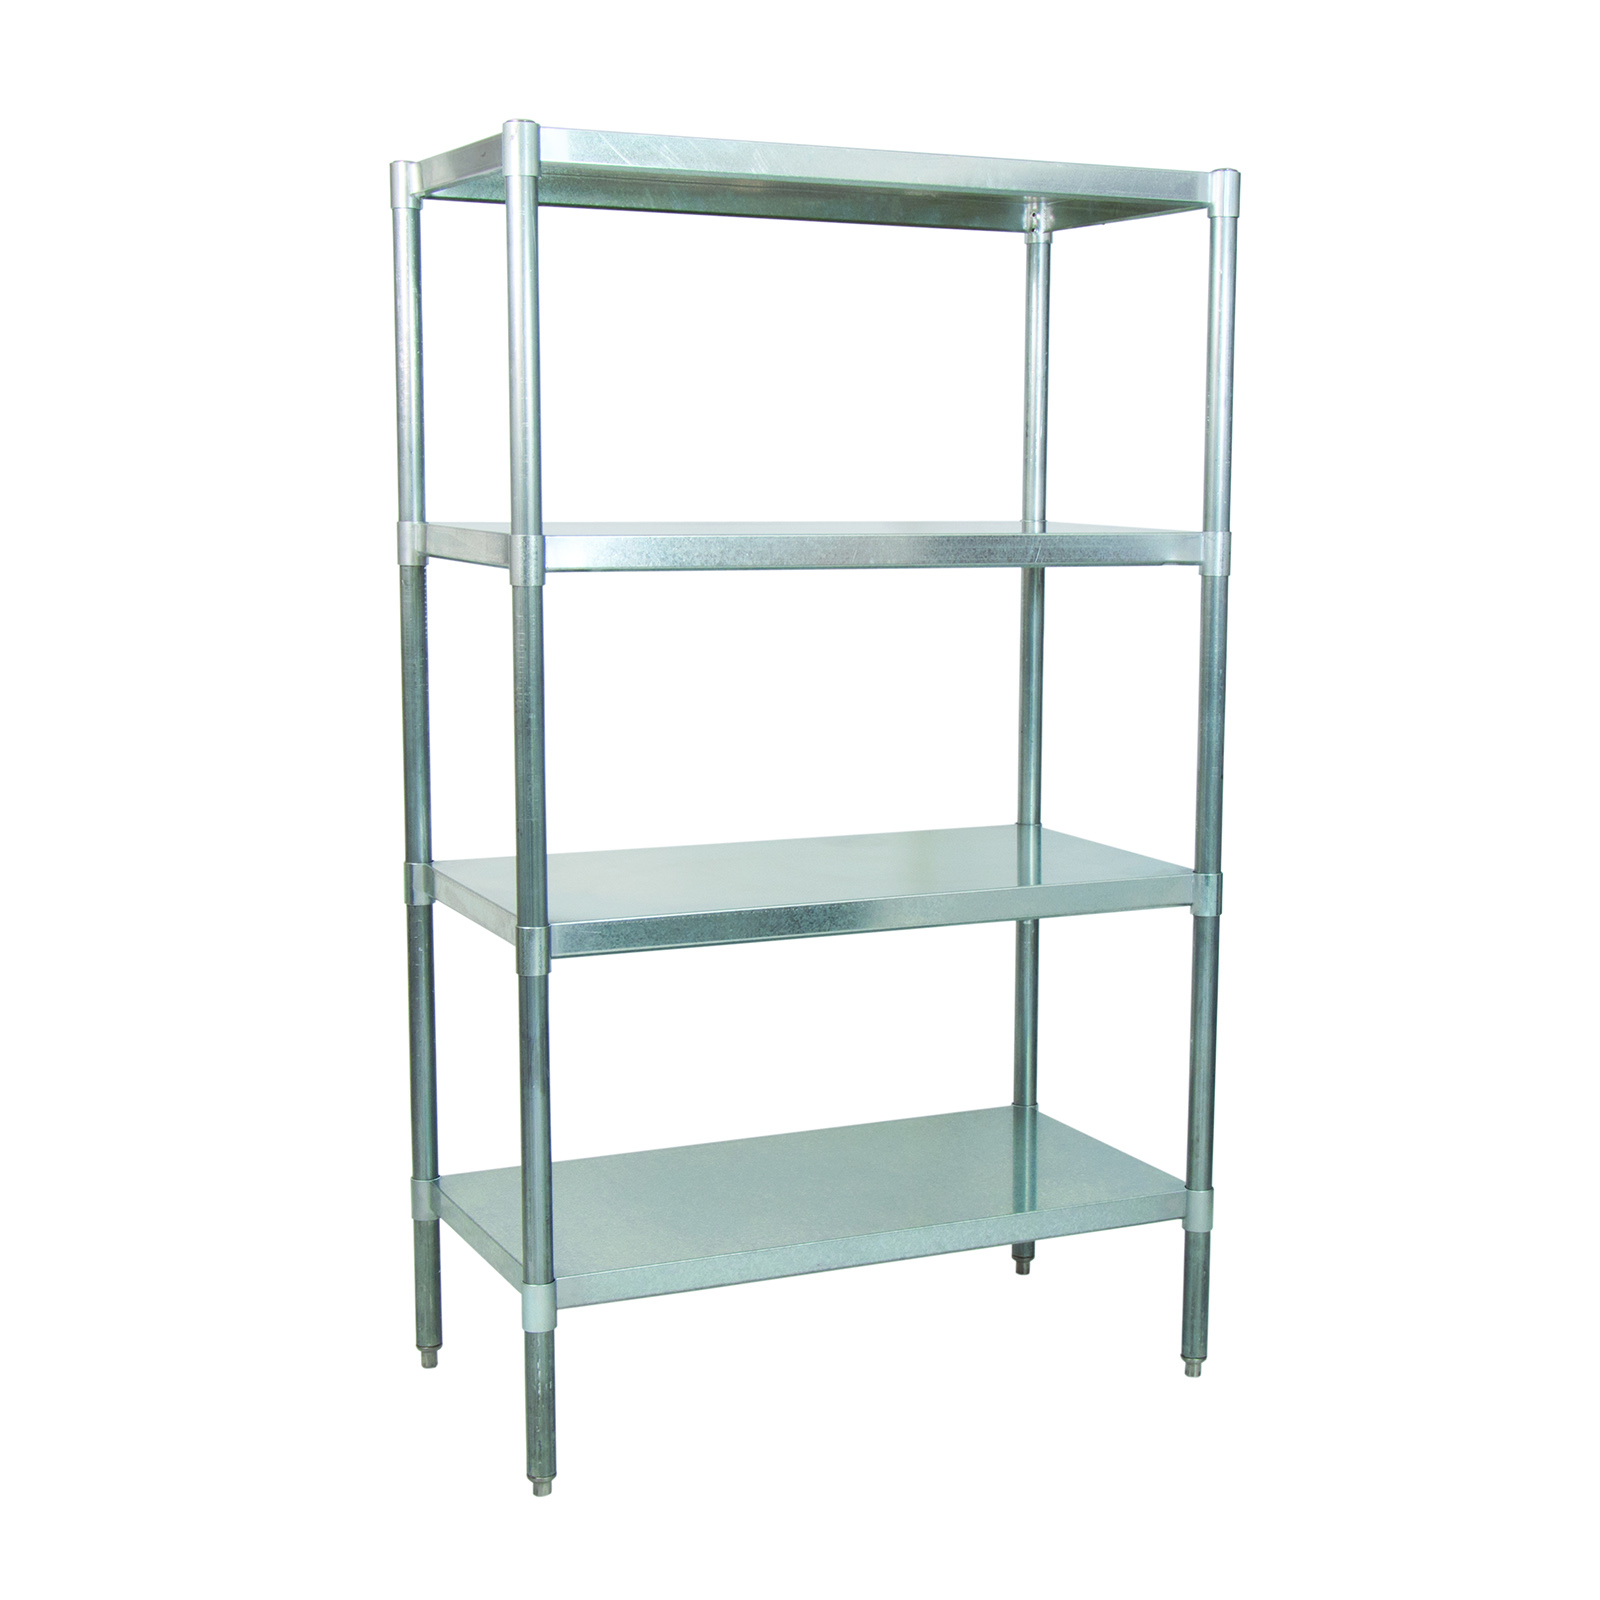 BK Resources VSU6-4324 shelving unit, solid flat